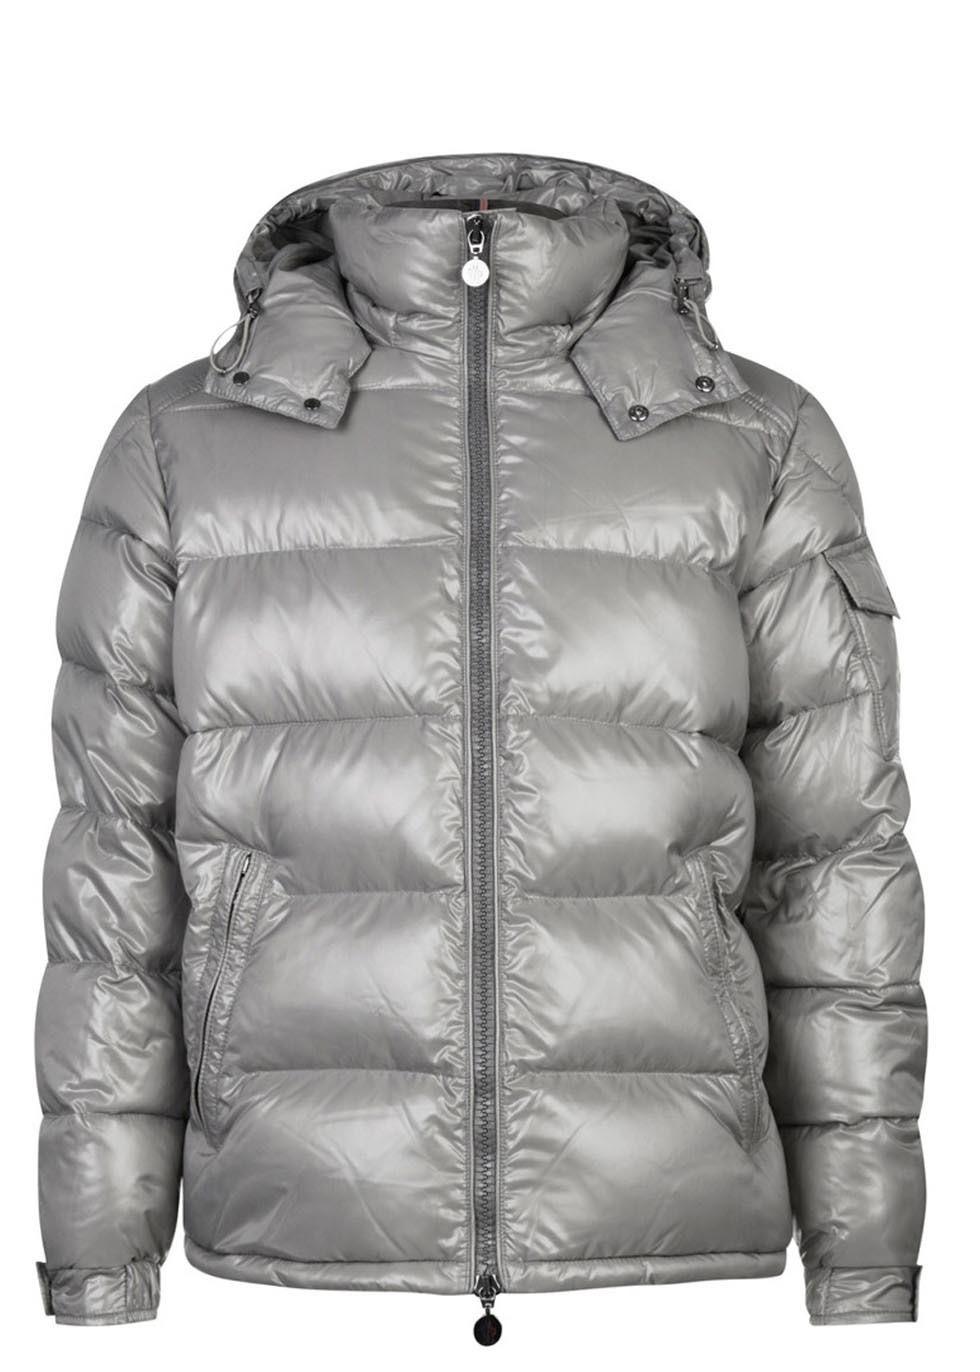 grey moncler hooded jacket